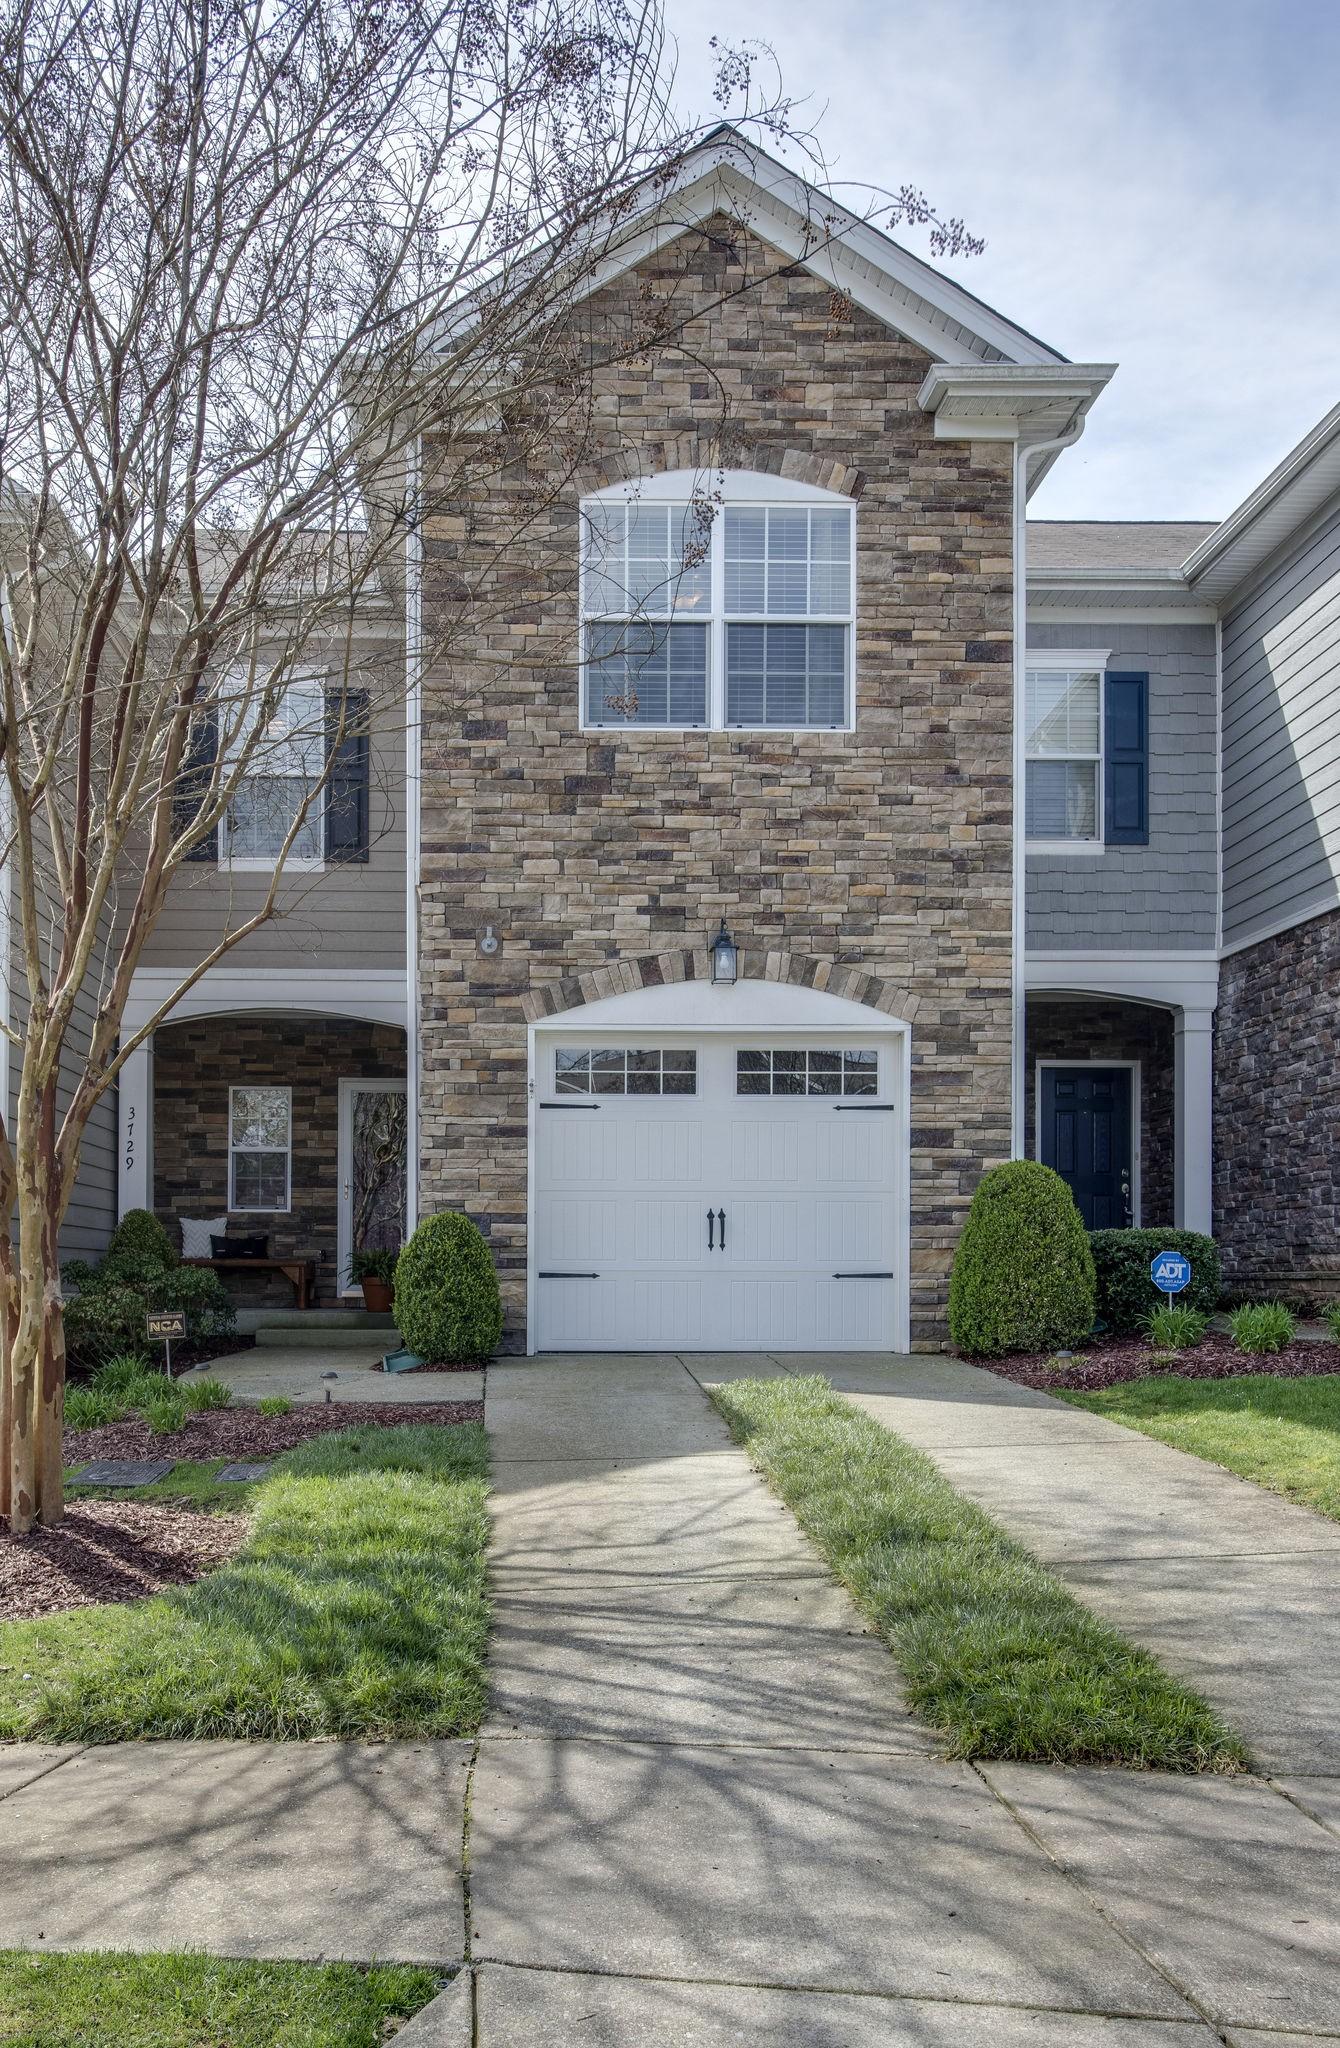 3729 Shane Point Pl, Nashville, TN 37211 - Nashville, TN real estate listing